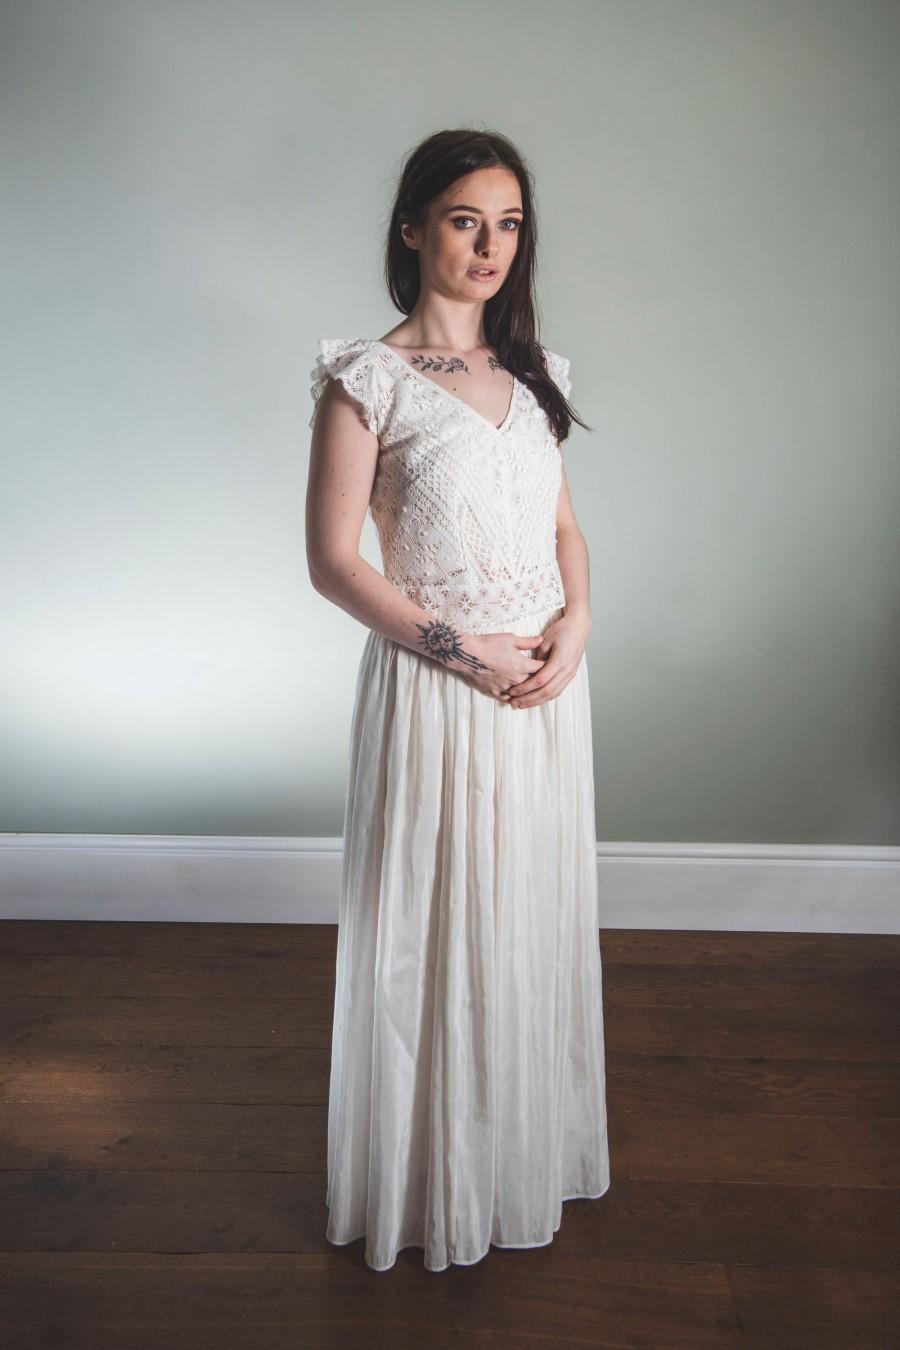 Mariage - Bridal Skirt - Long skirt in hemp silk, casual wedding, wedding separates, eco wedding skirt, hemp silk skirt, gathered waist bridal skirt